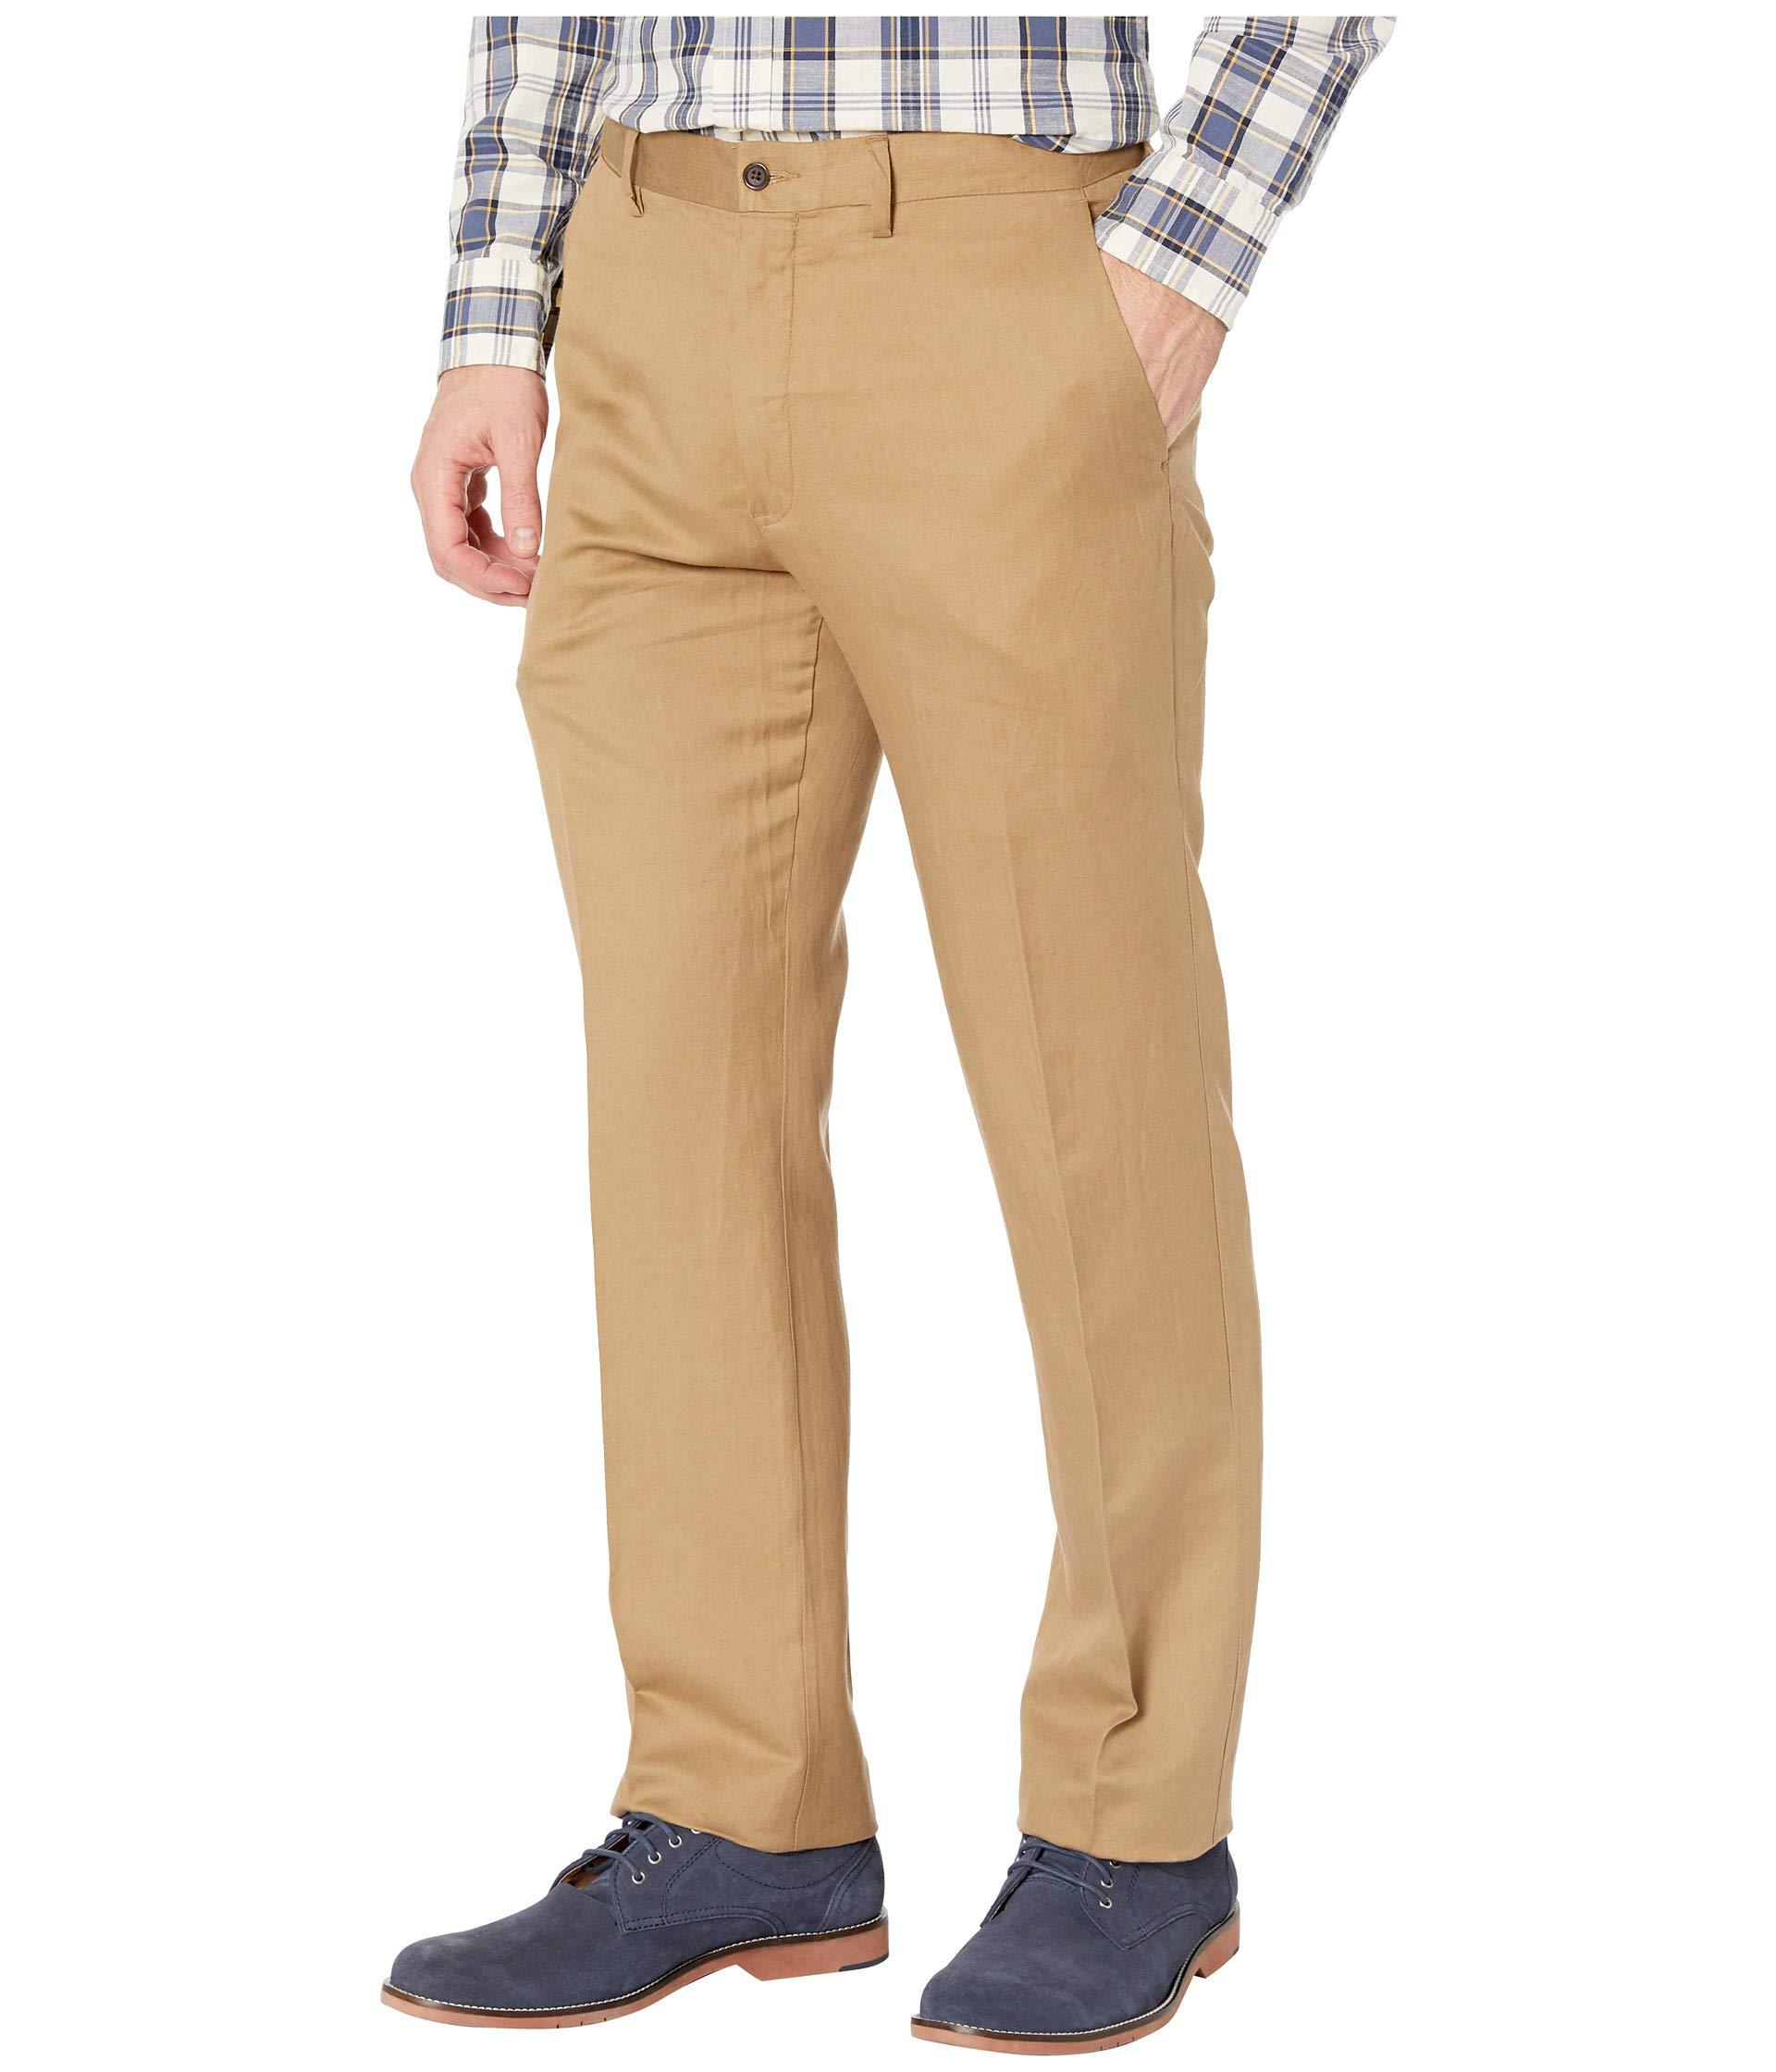 4f48299c4 Lyst - Polo Ralph Lauren Linen Lyocell Blend Newport Flat Classic Fit Pants  (desert Khaki) Men s Clothing in Natural for Men